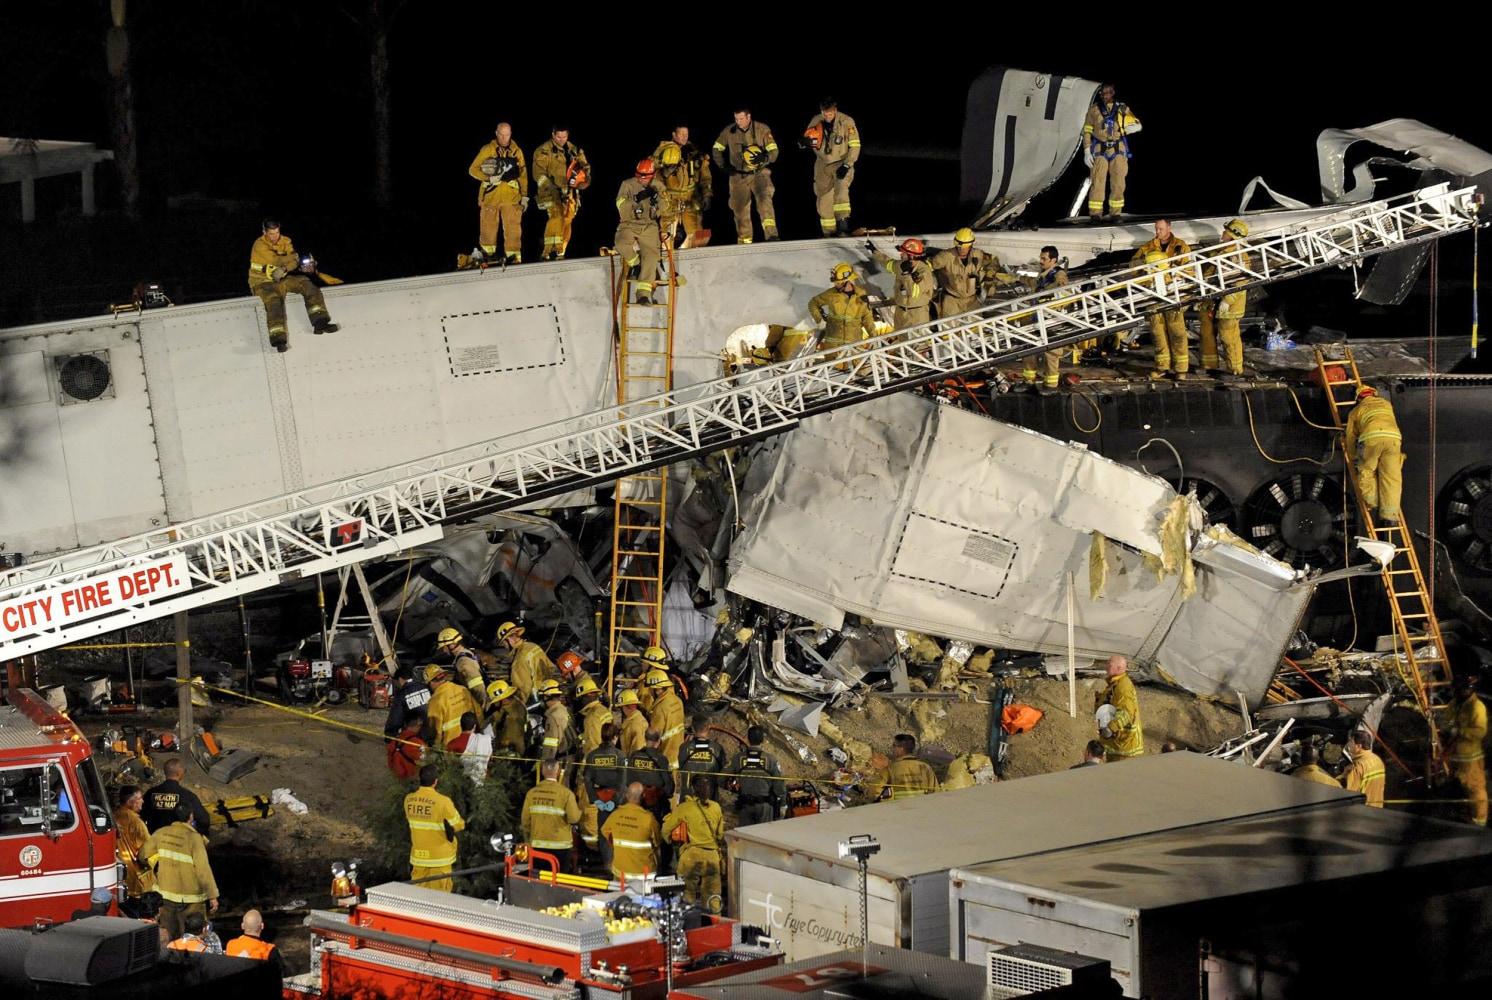 25 dead in L.A. train crash; recovery ends - SFGate  |Chatsworth Train Wreck California